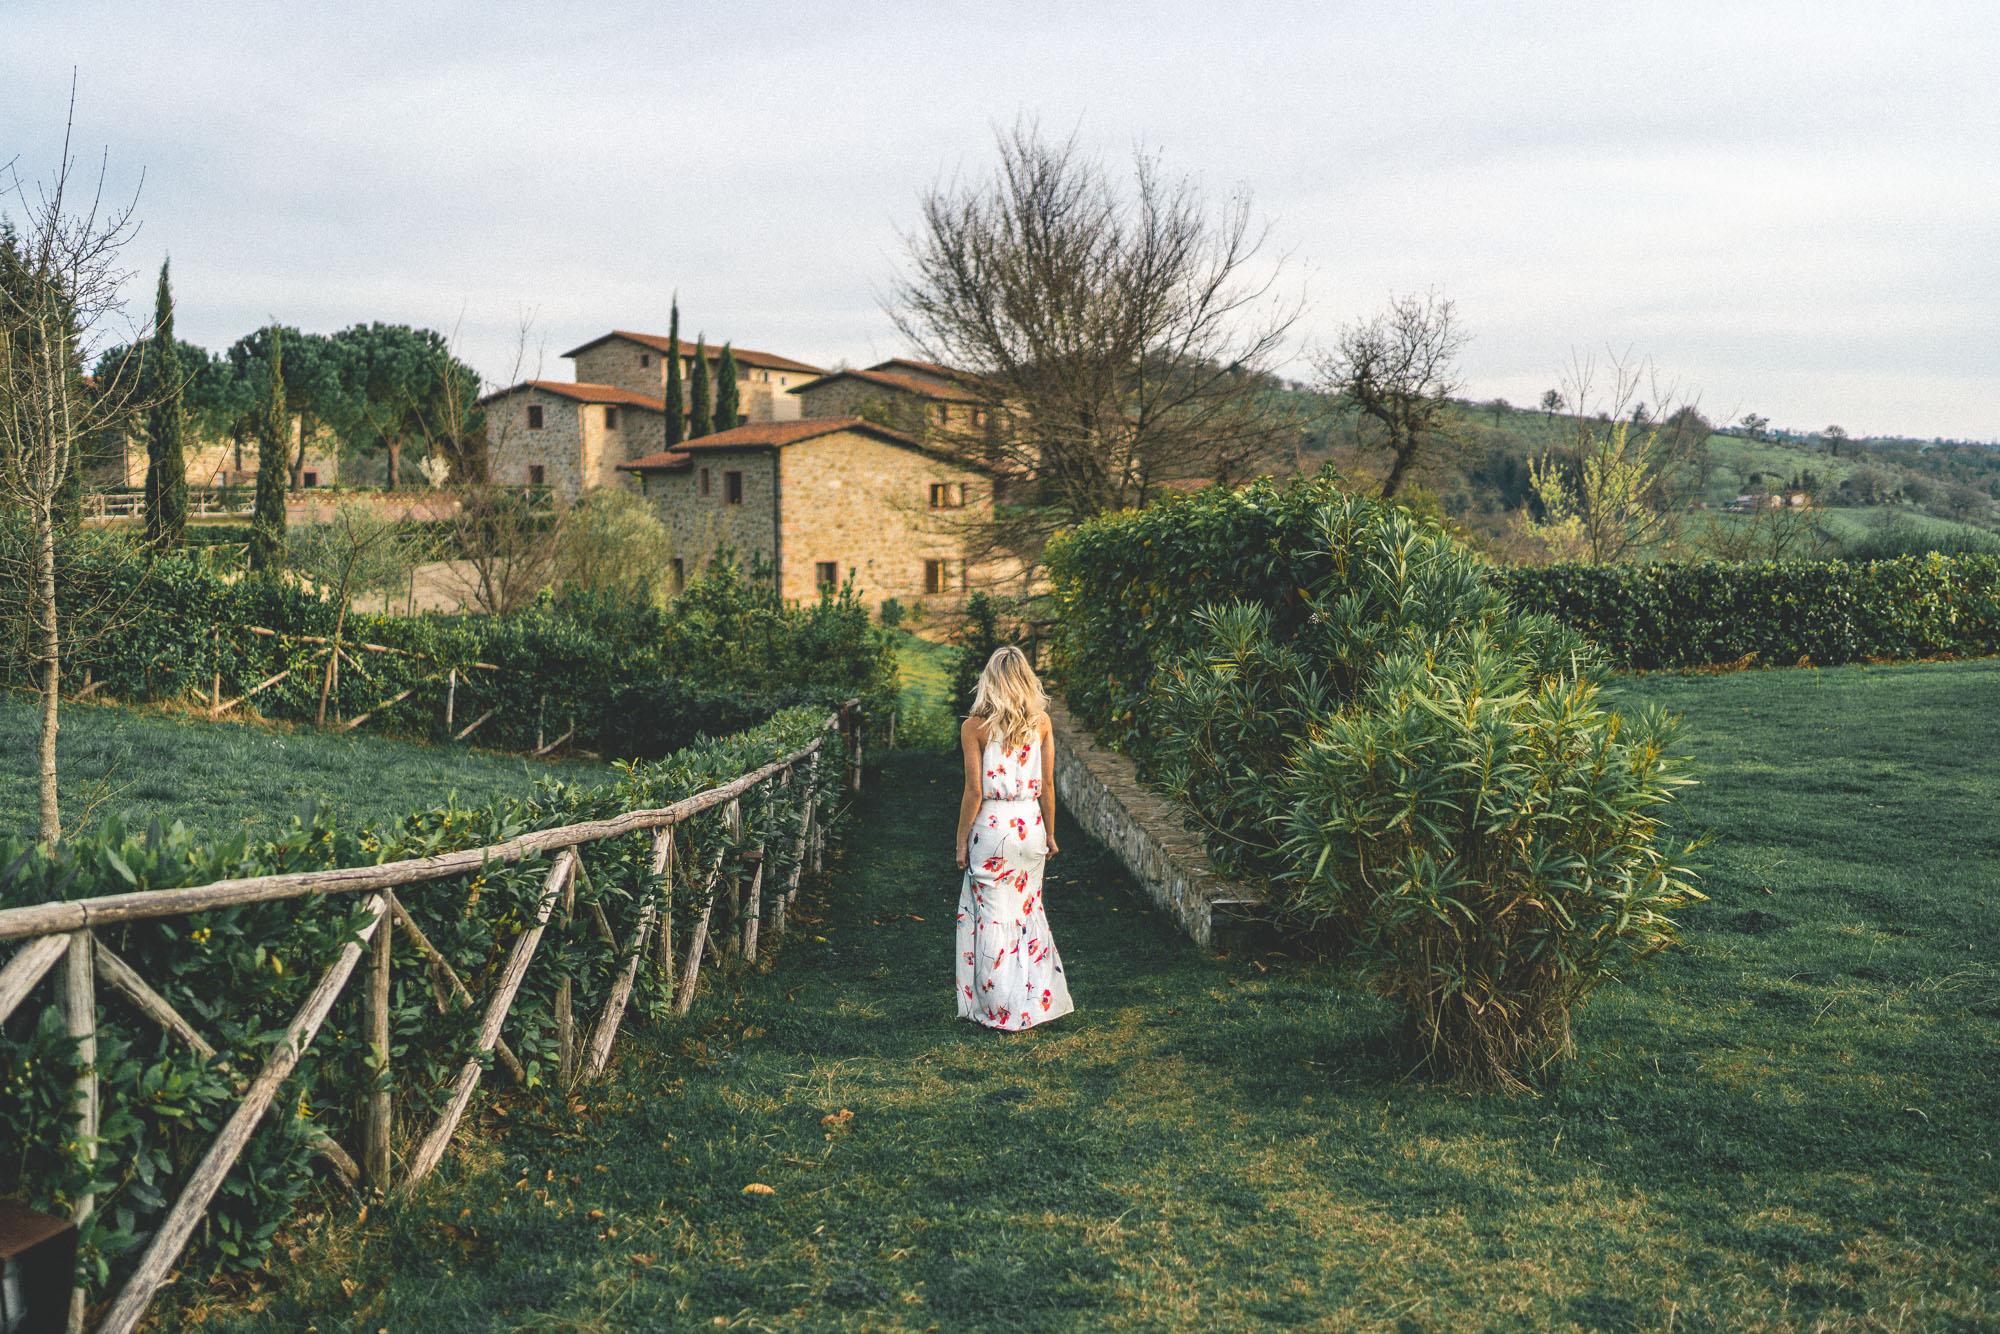 Romantic Borgo Case Bardi tuscan villa in southern Tuscany, Italy